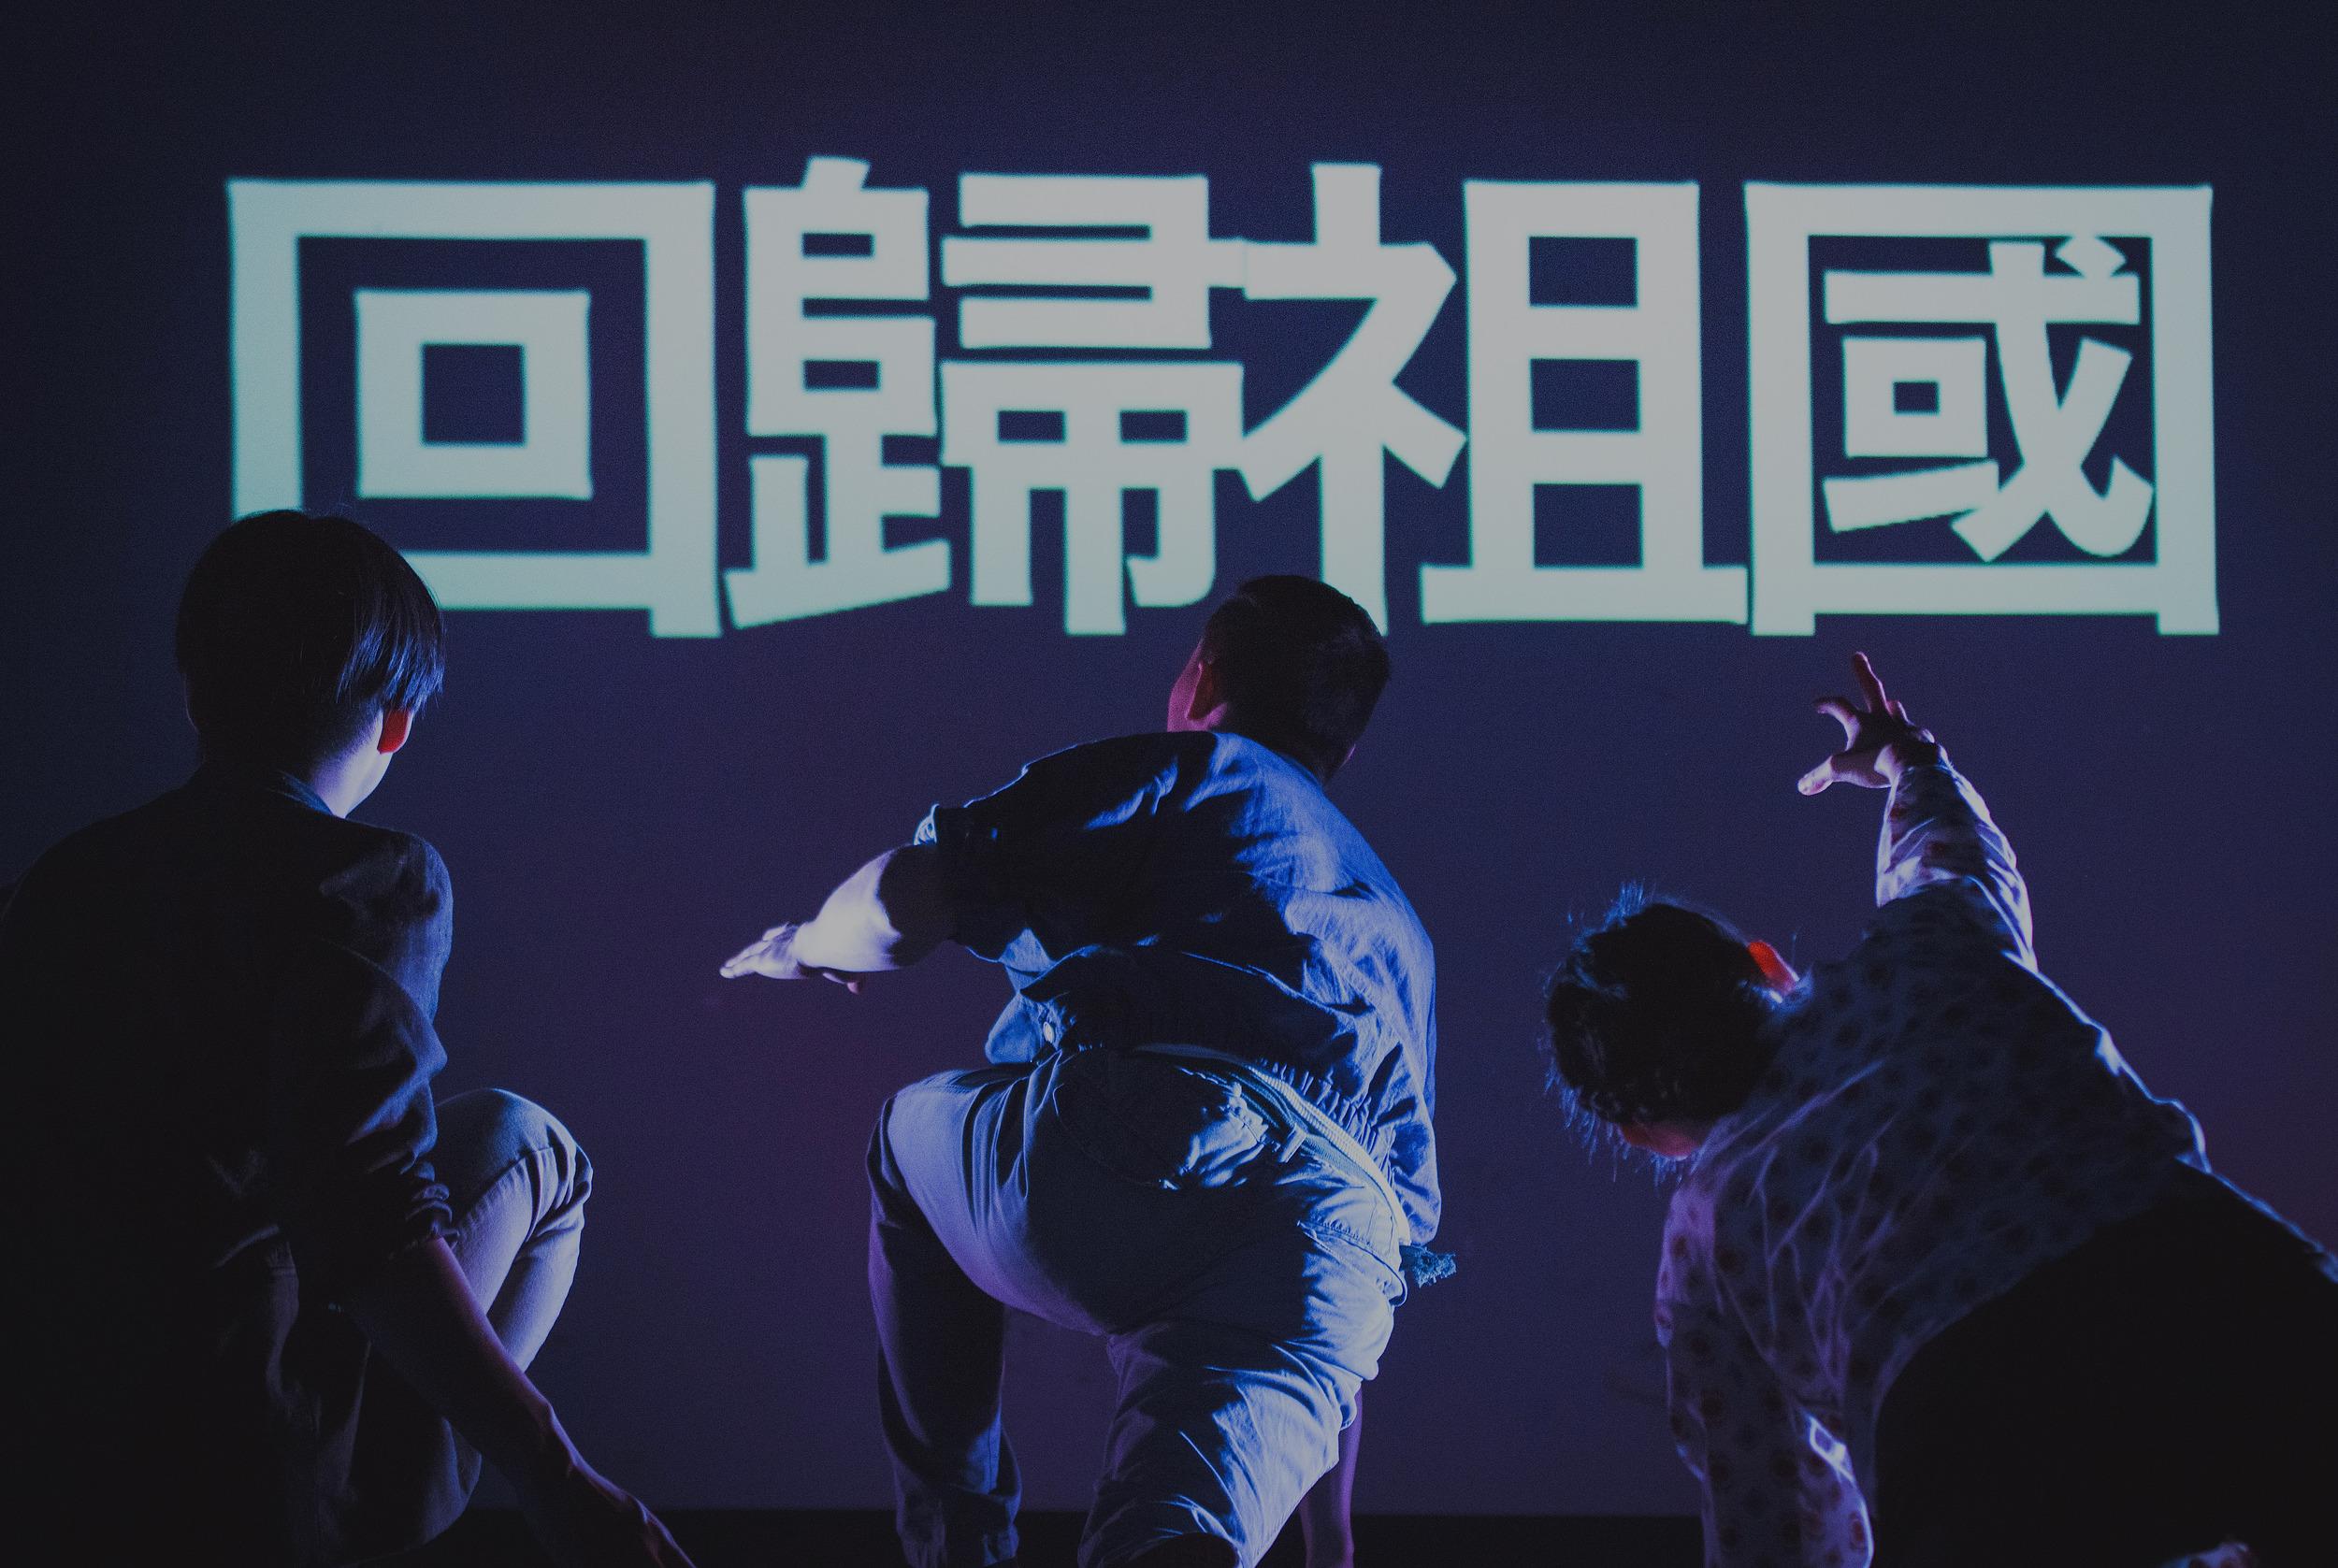 HKX - NINEEIGHT Promotional Photo 3.jpg